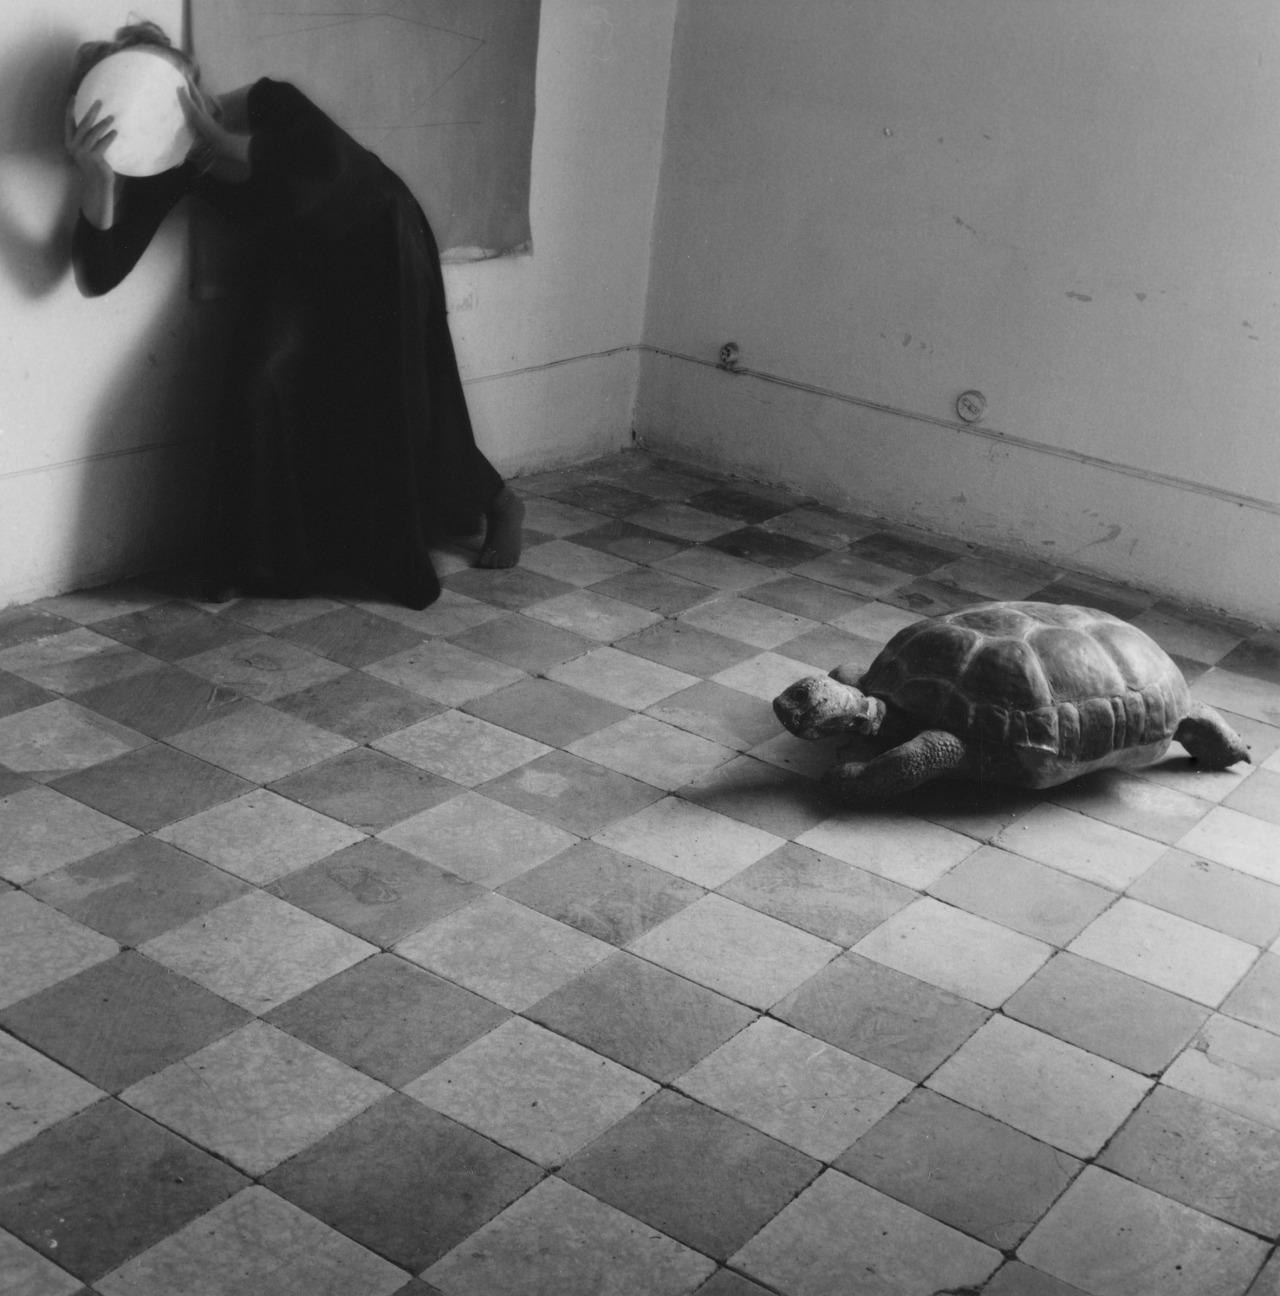 Francesca Woodman - Ancora un altro cielo plumbeo Roma 1977-78